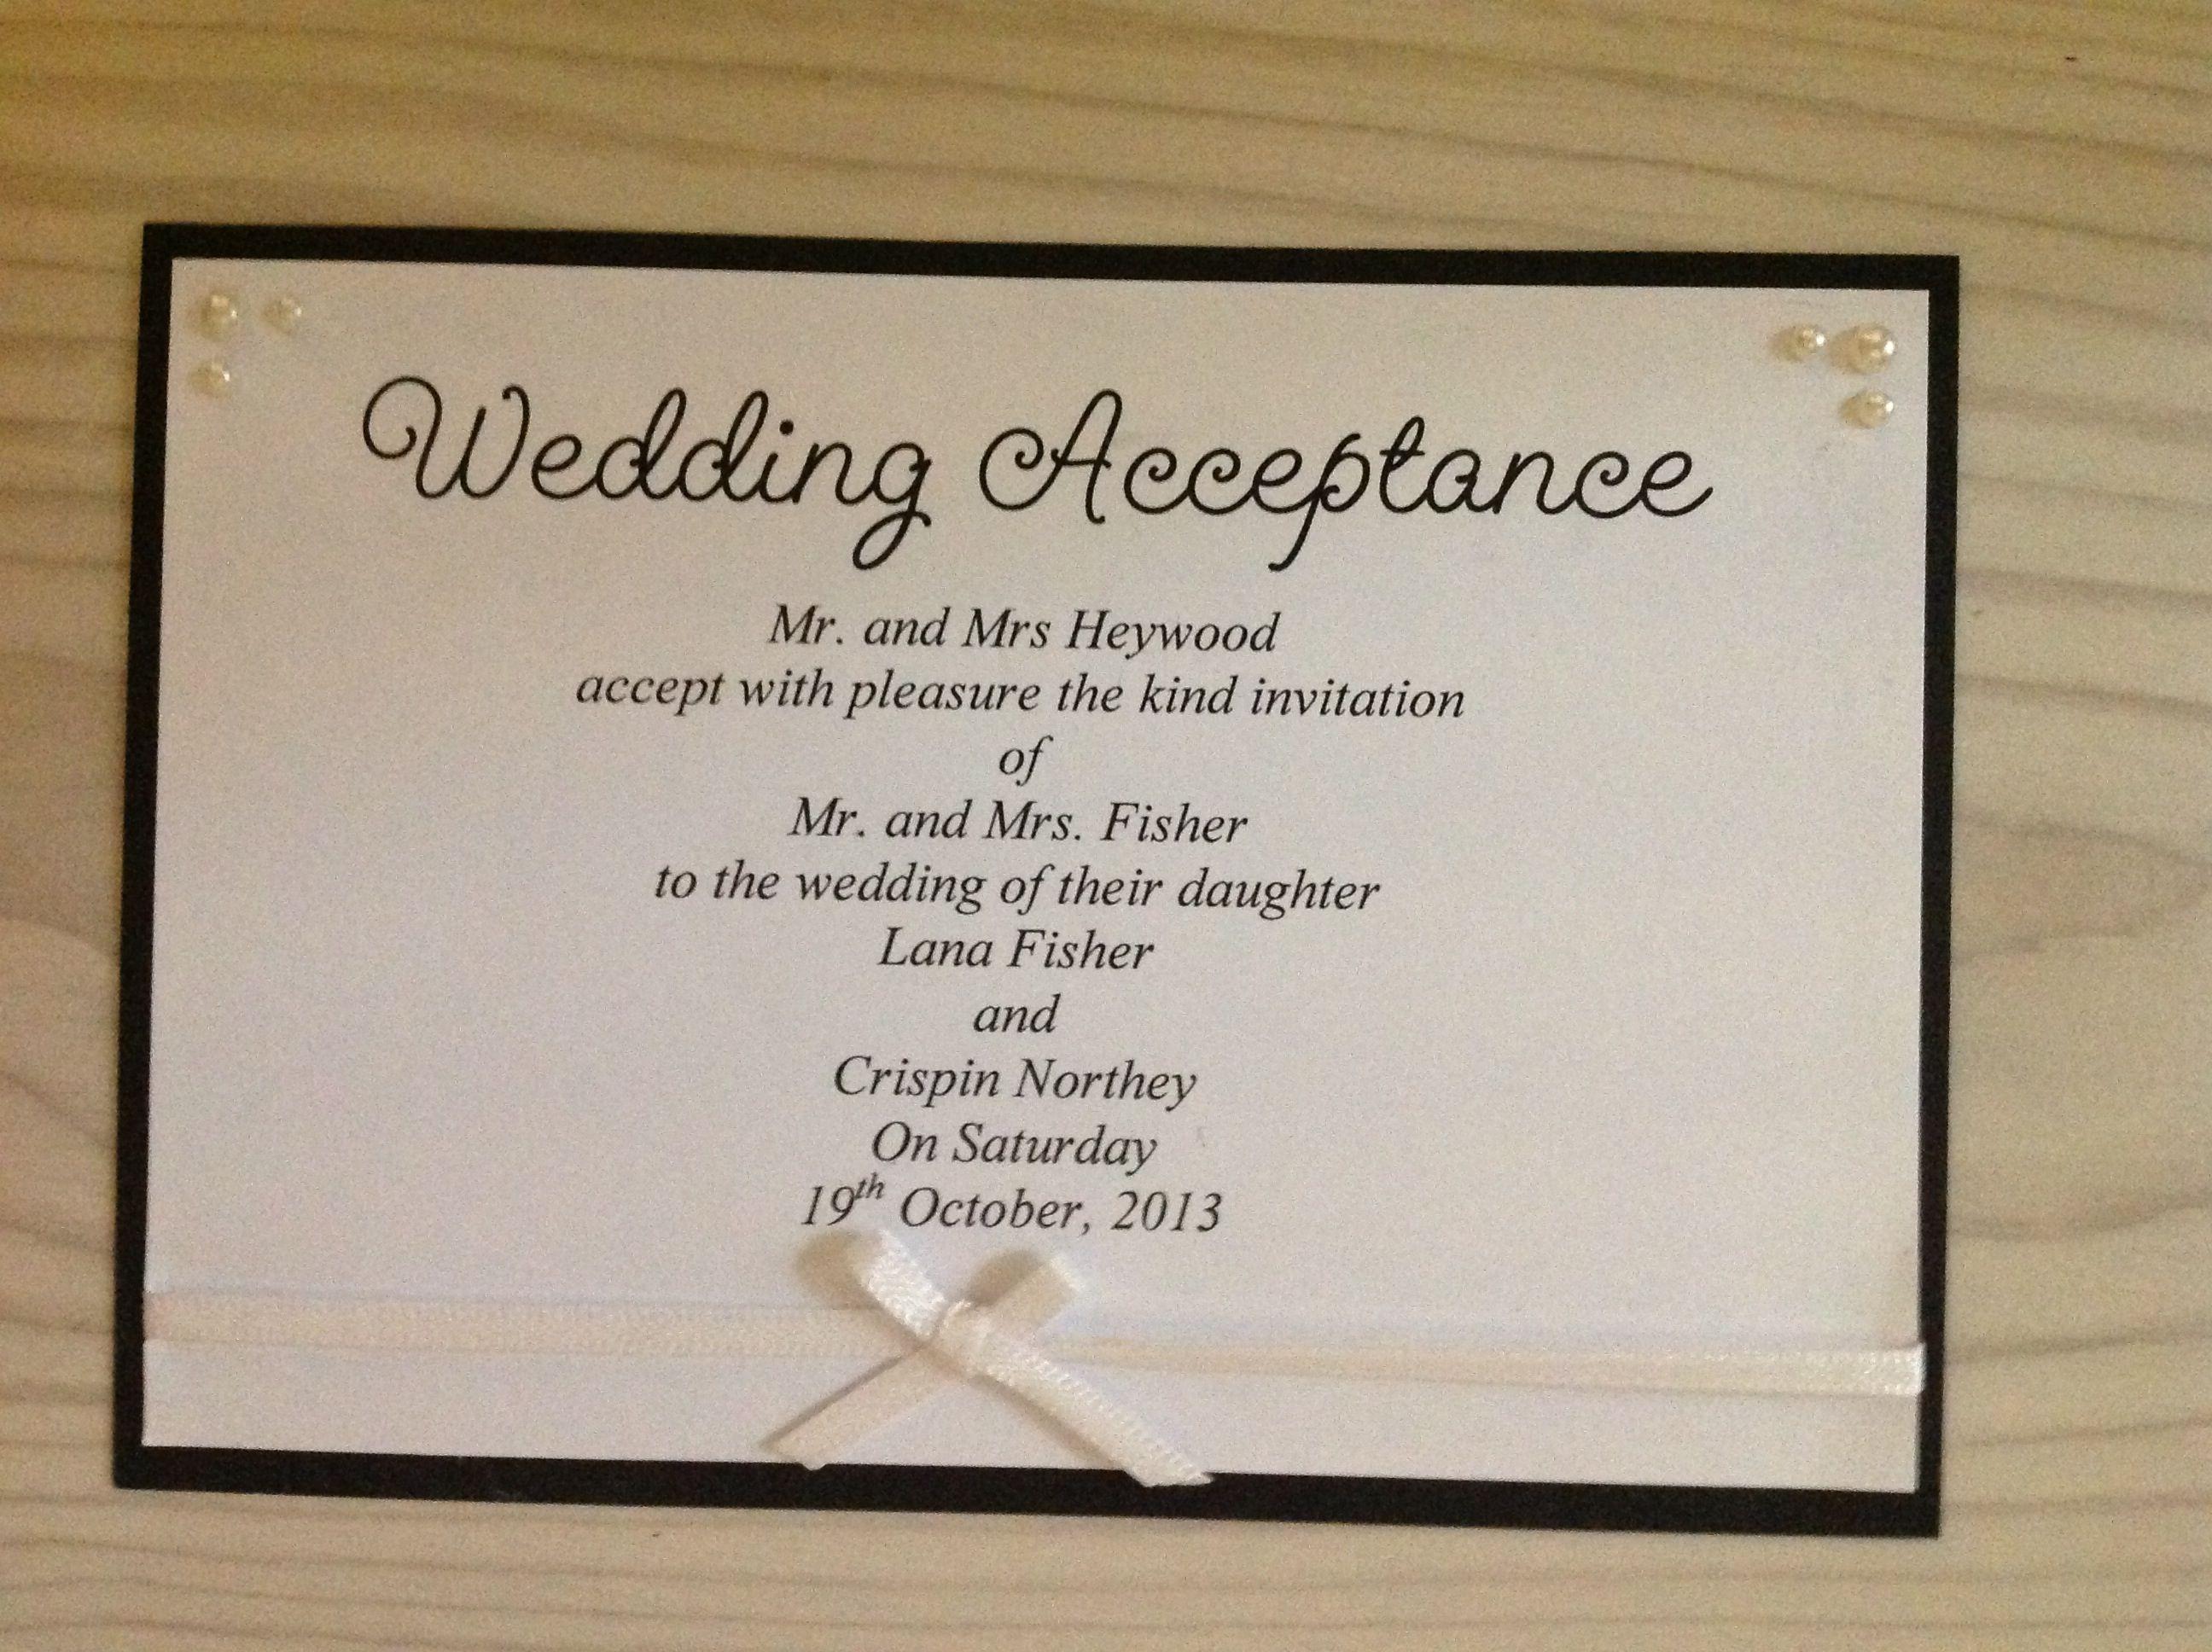 Wedding Acceptance Handmade Pearls And Bows Rsvp Wedding Acceptance Card Wedding Cards Wedding Cards Handmade